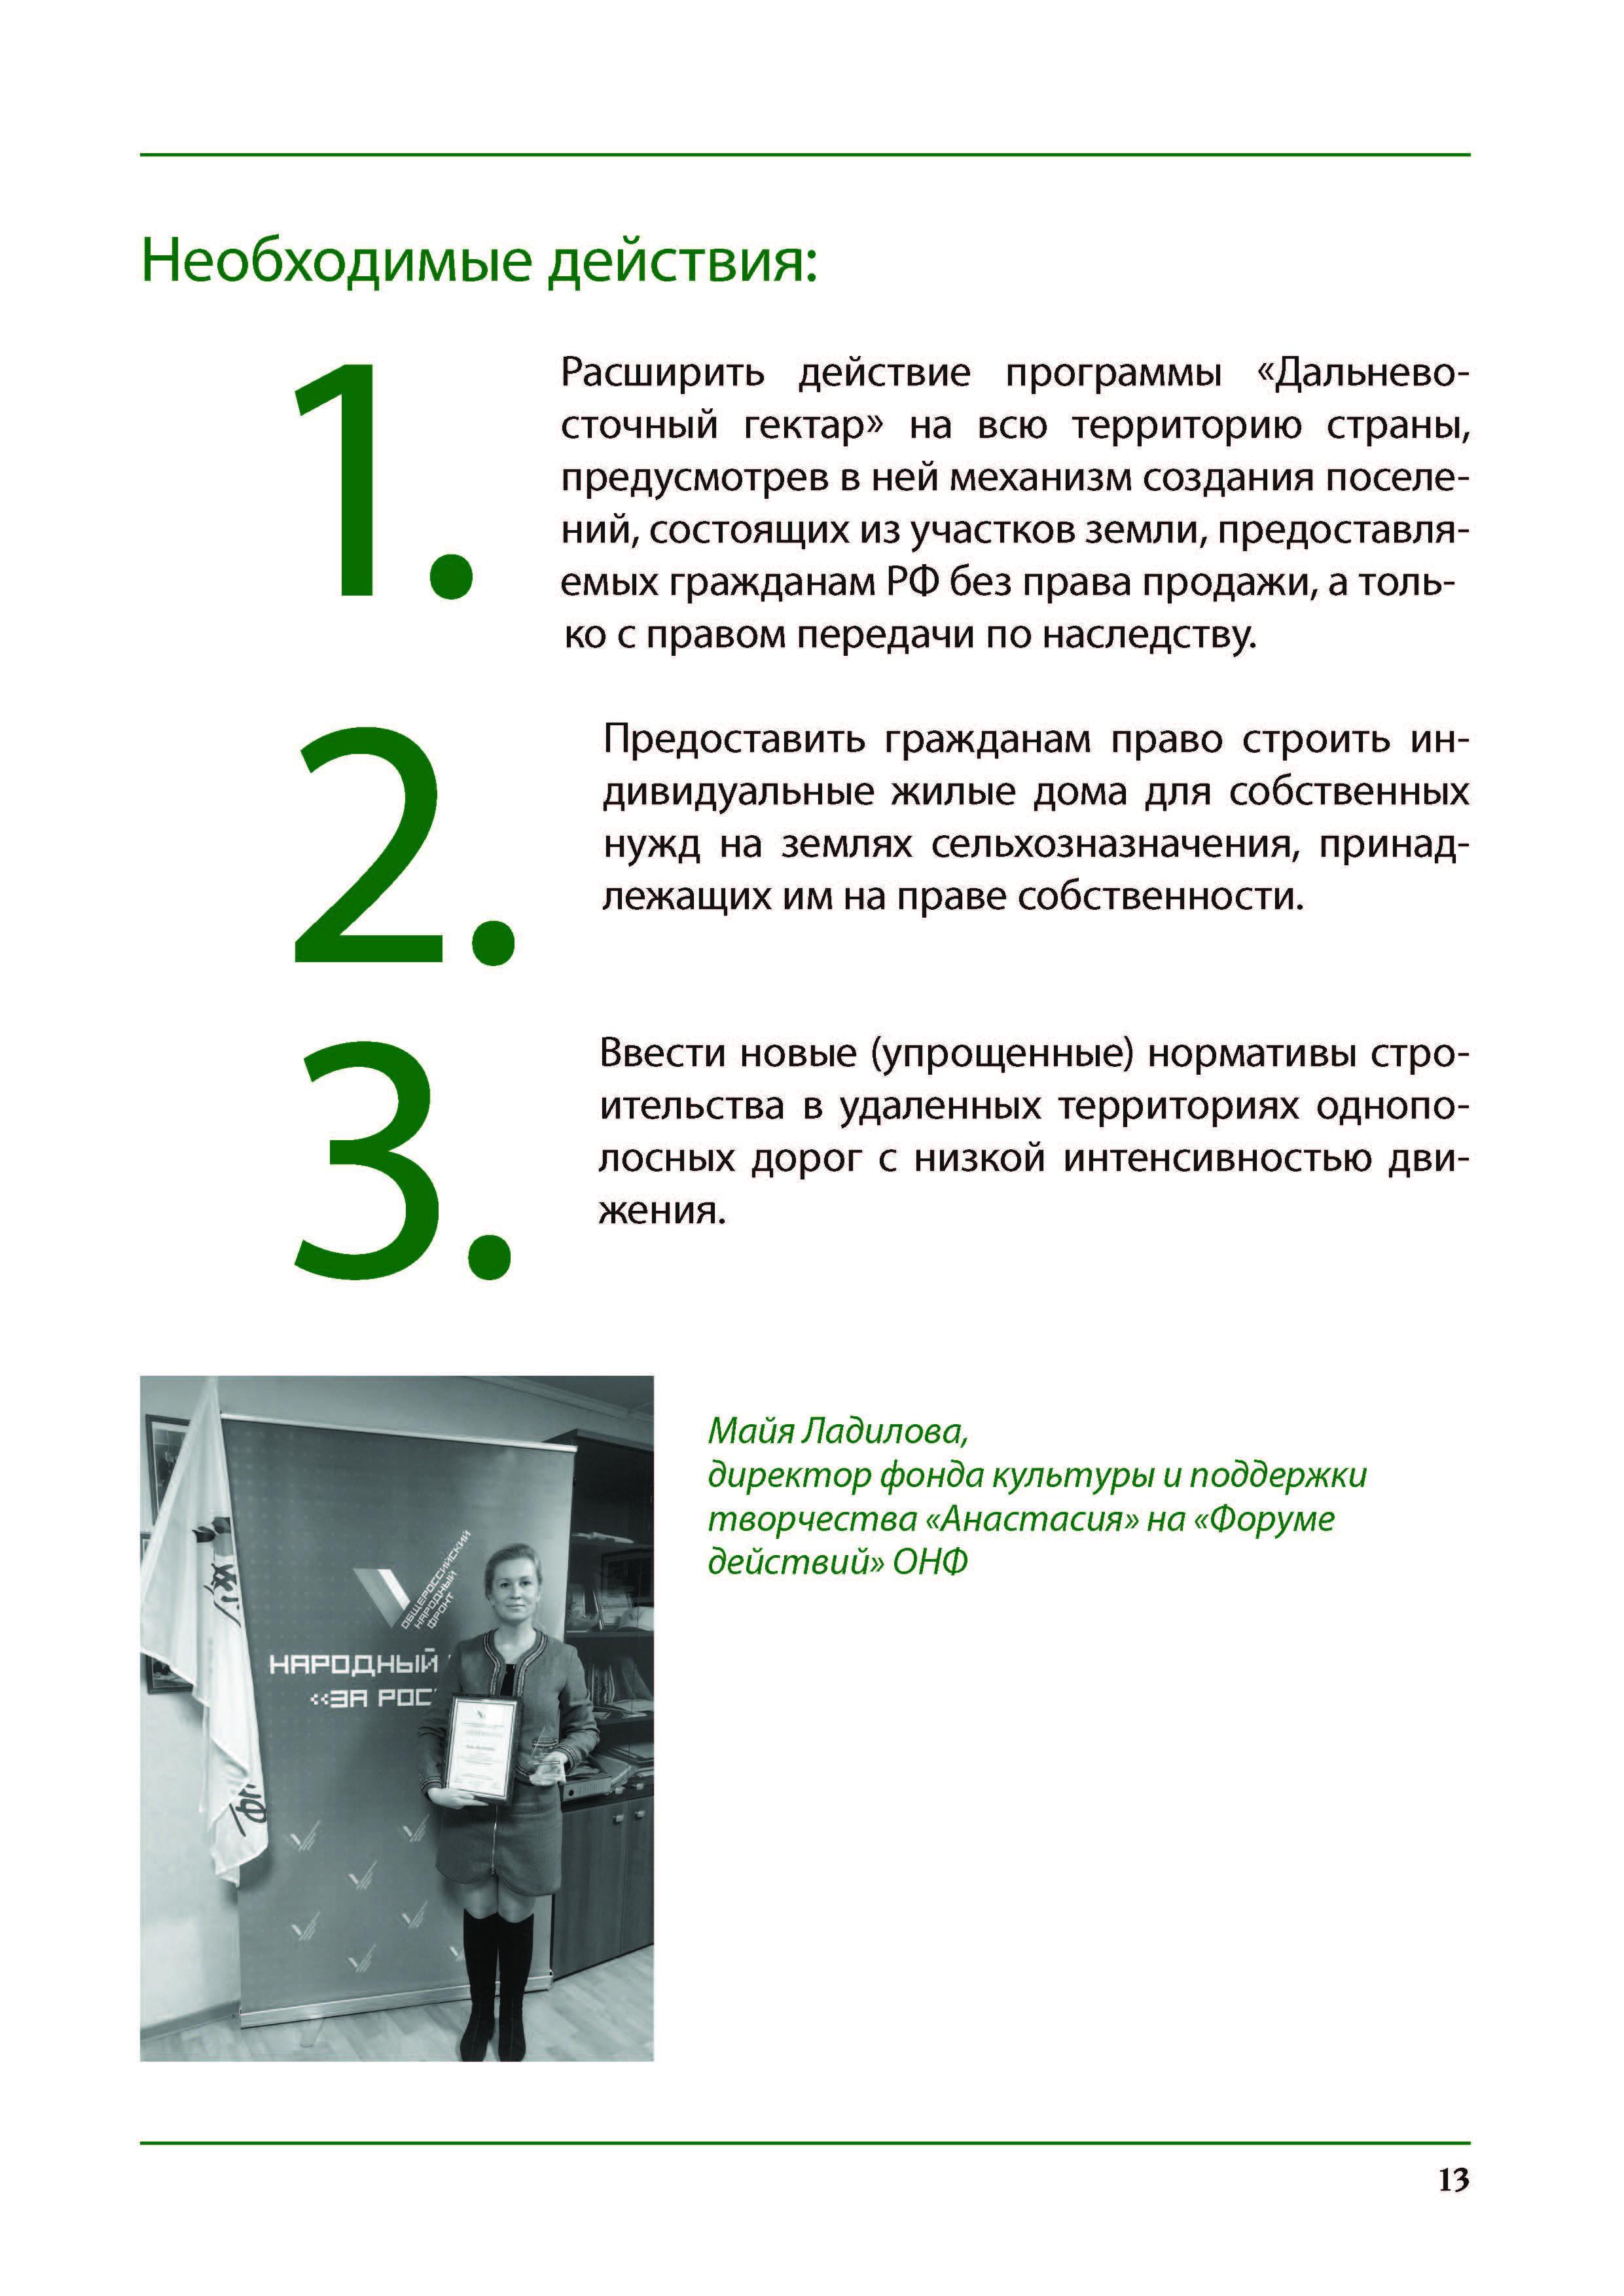 Фонд Поправка Конституция (13).jpg